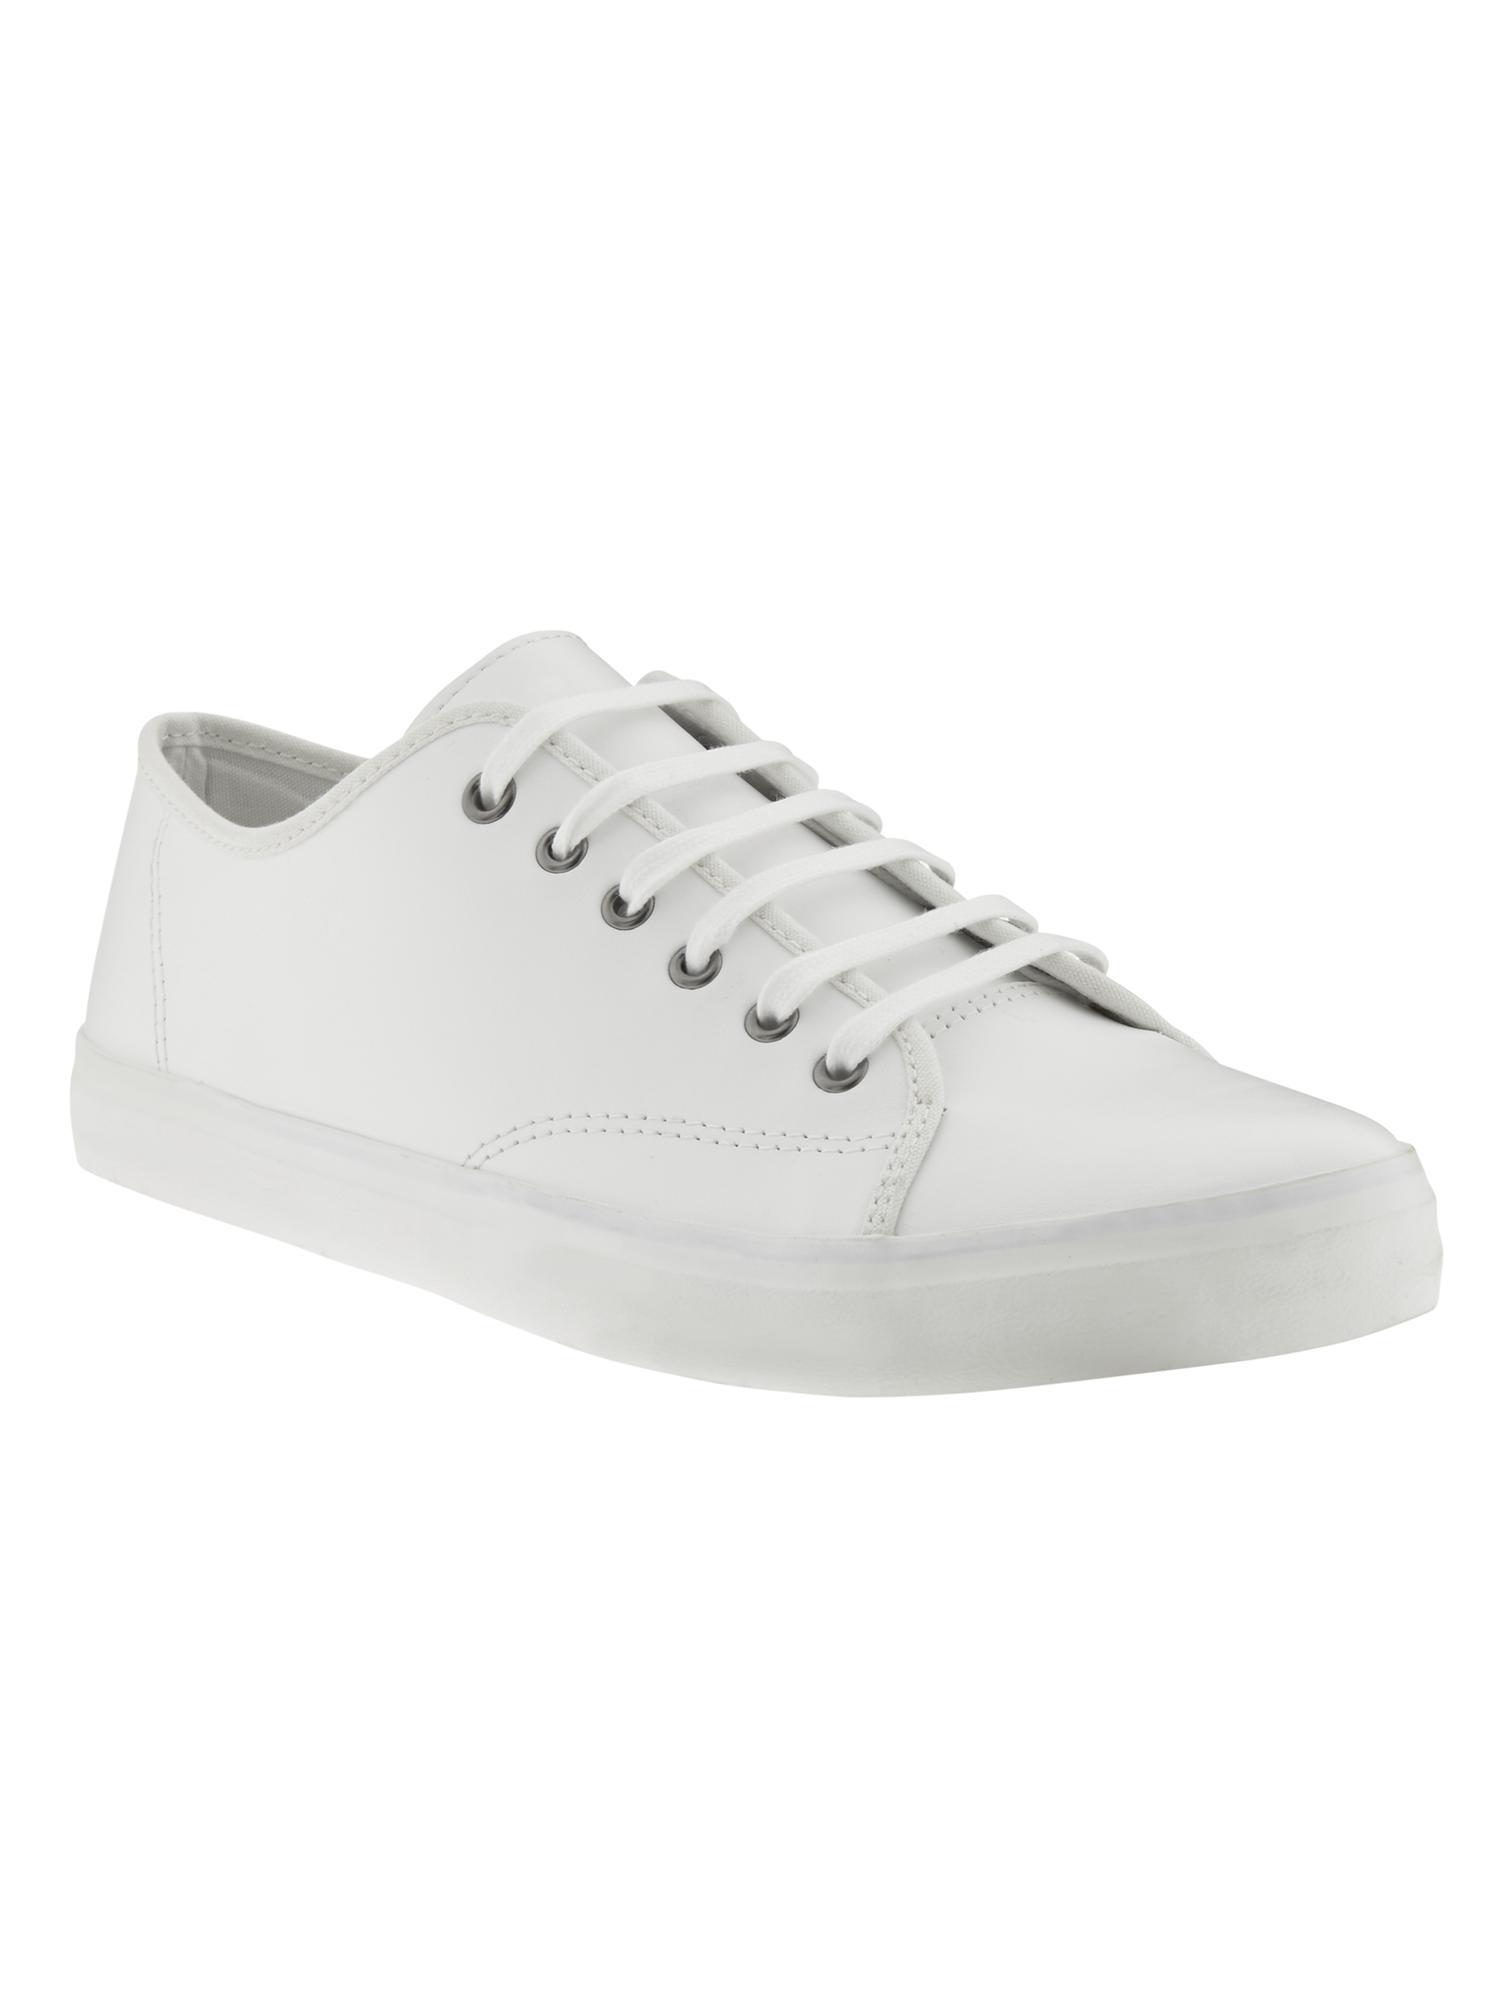 Banana Republic Logan Sneaker in White